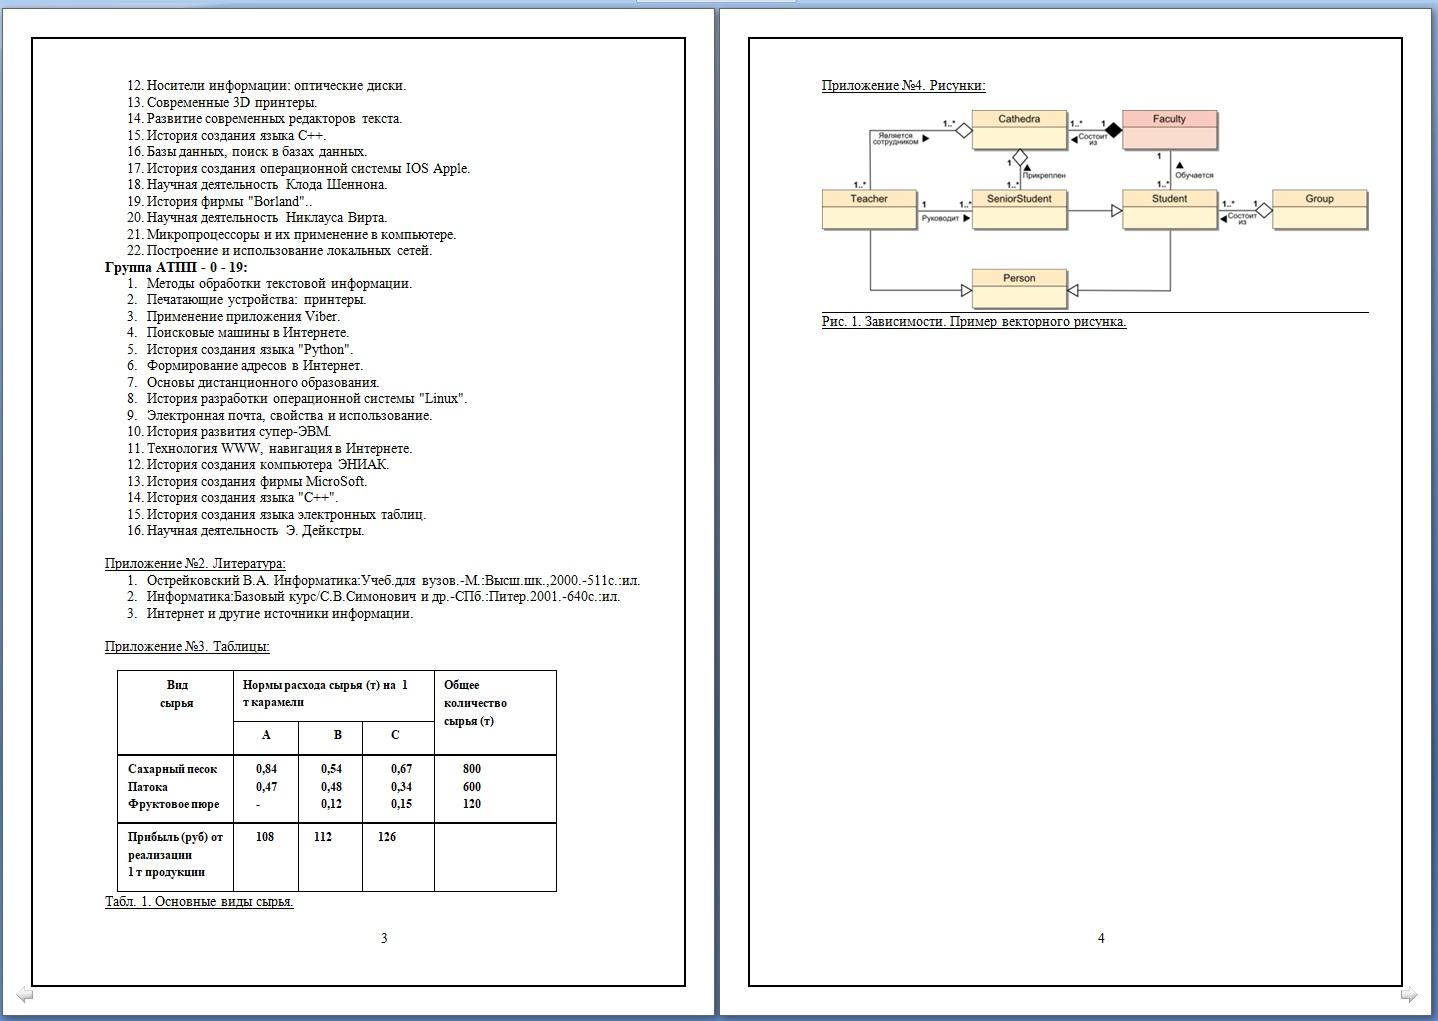 90-pm-as-atpp-dr-1-tekst-redaktor_2